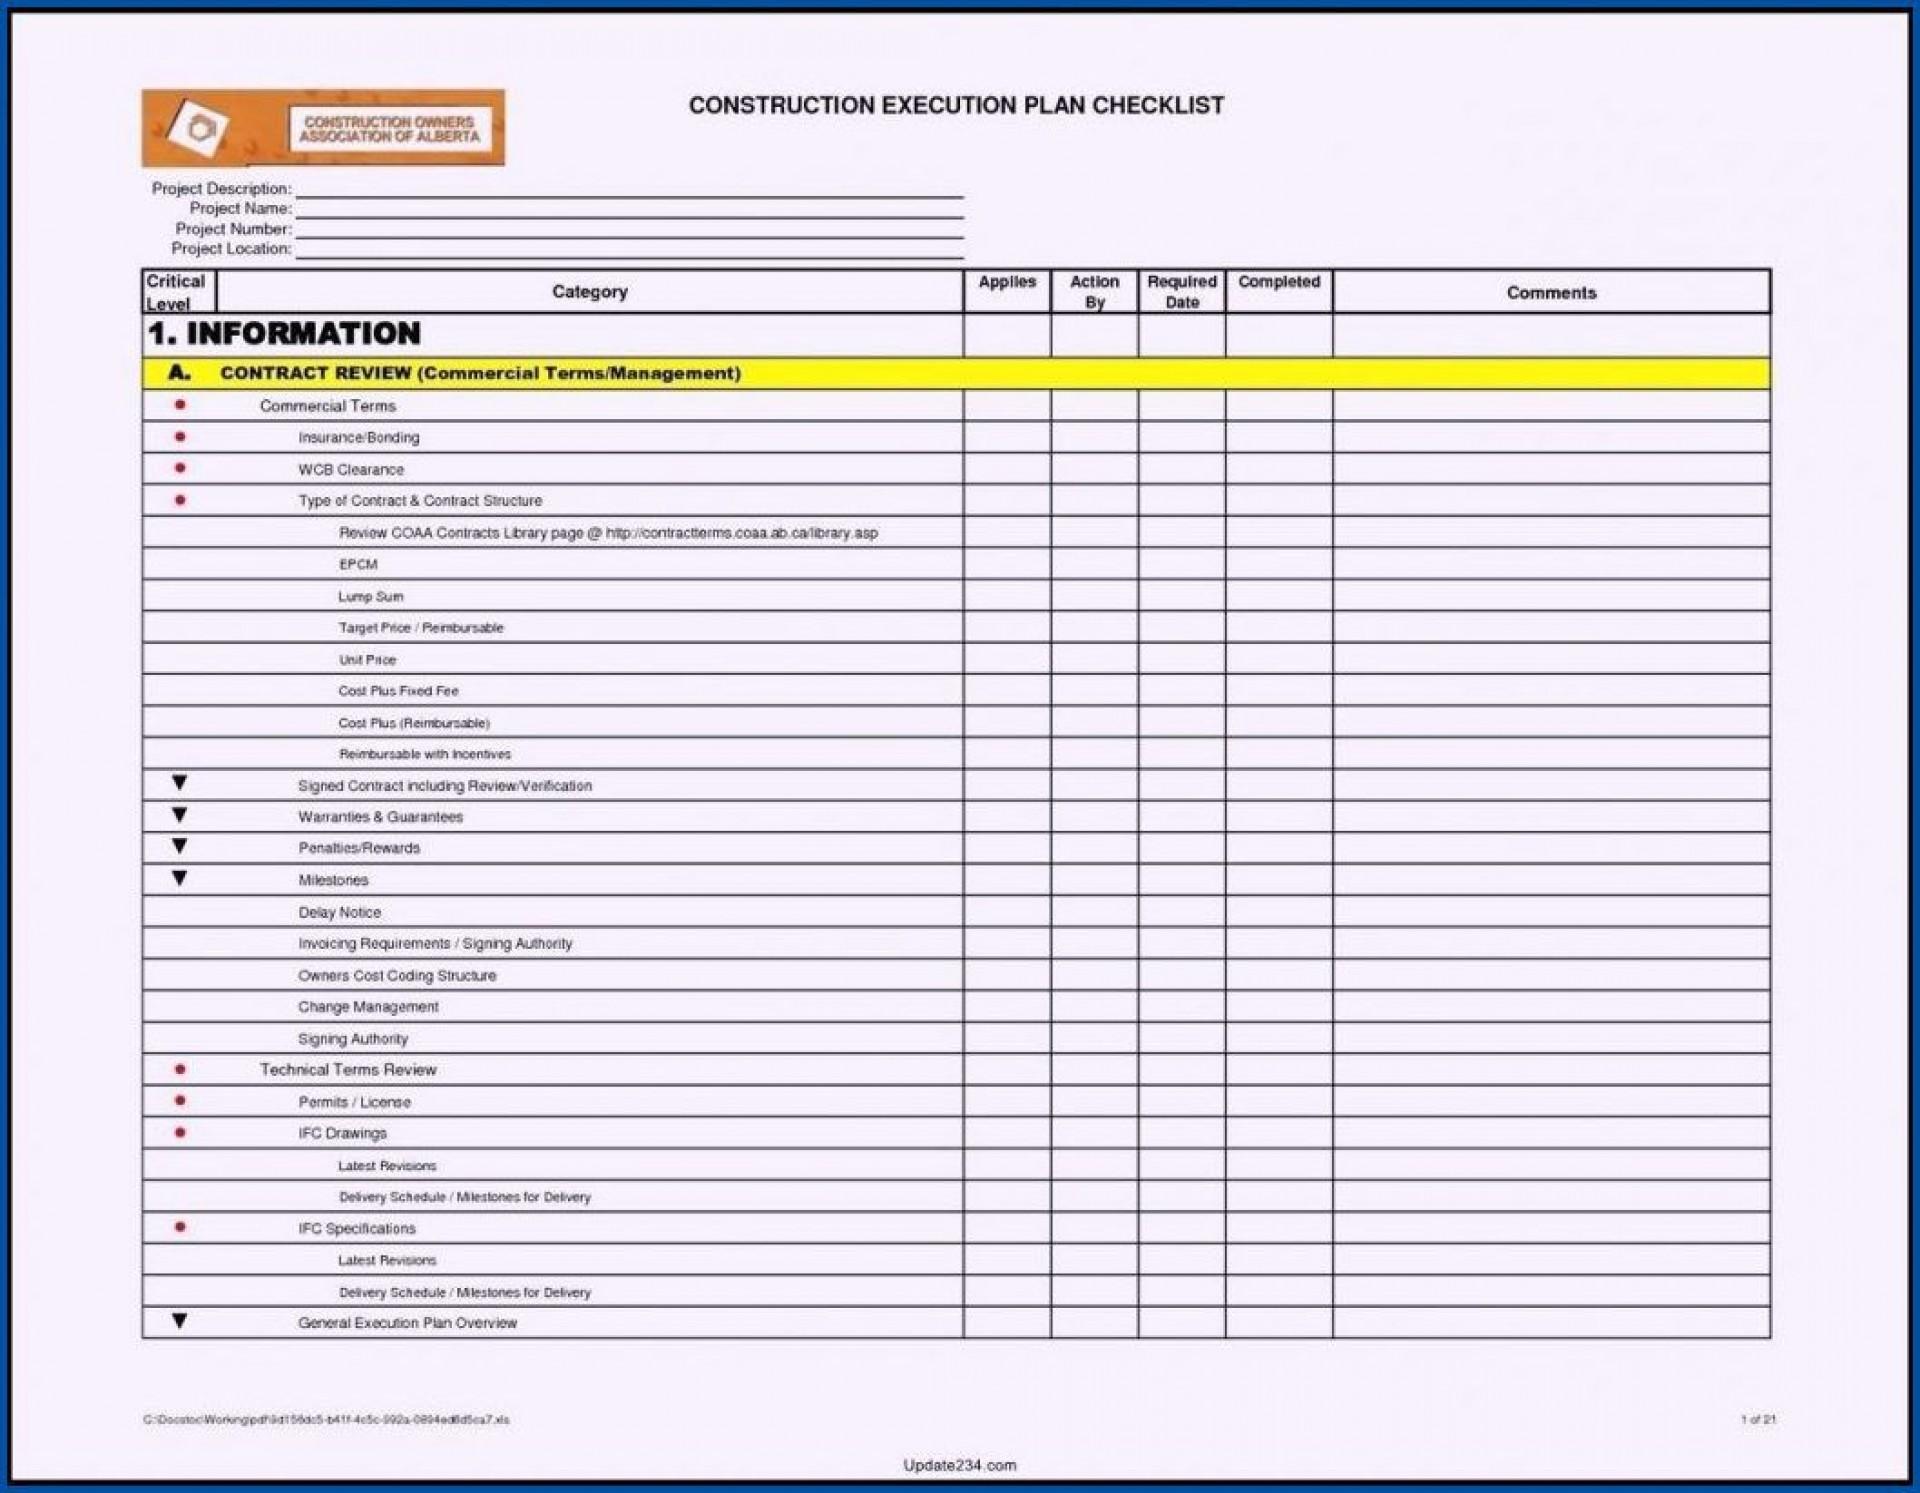 003 Fantastic Project Management Checklist Template High Def  Audit Excel Plan1920